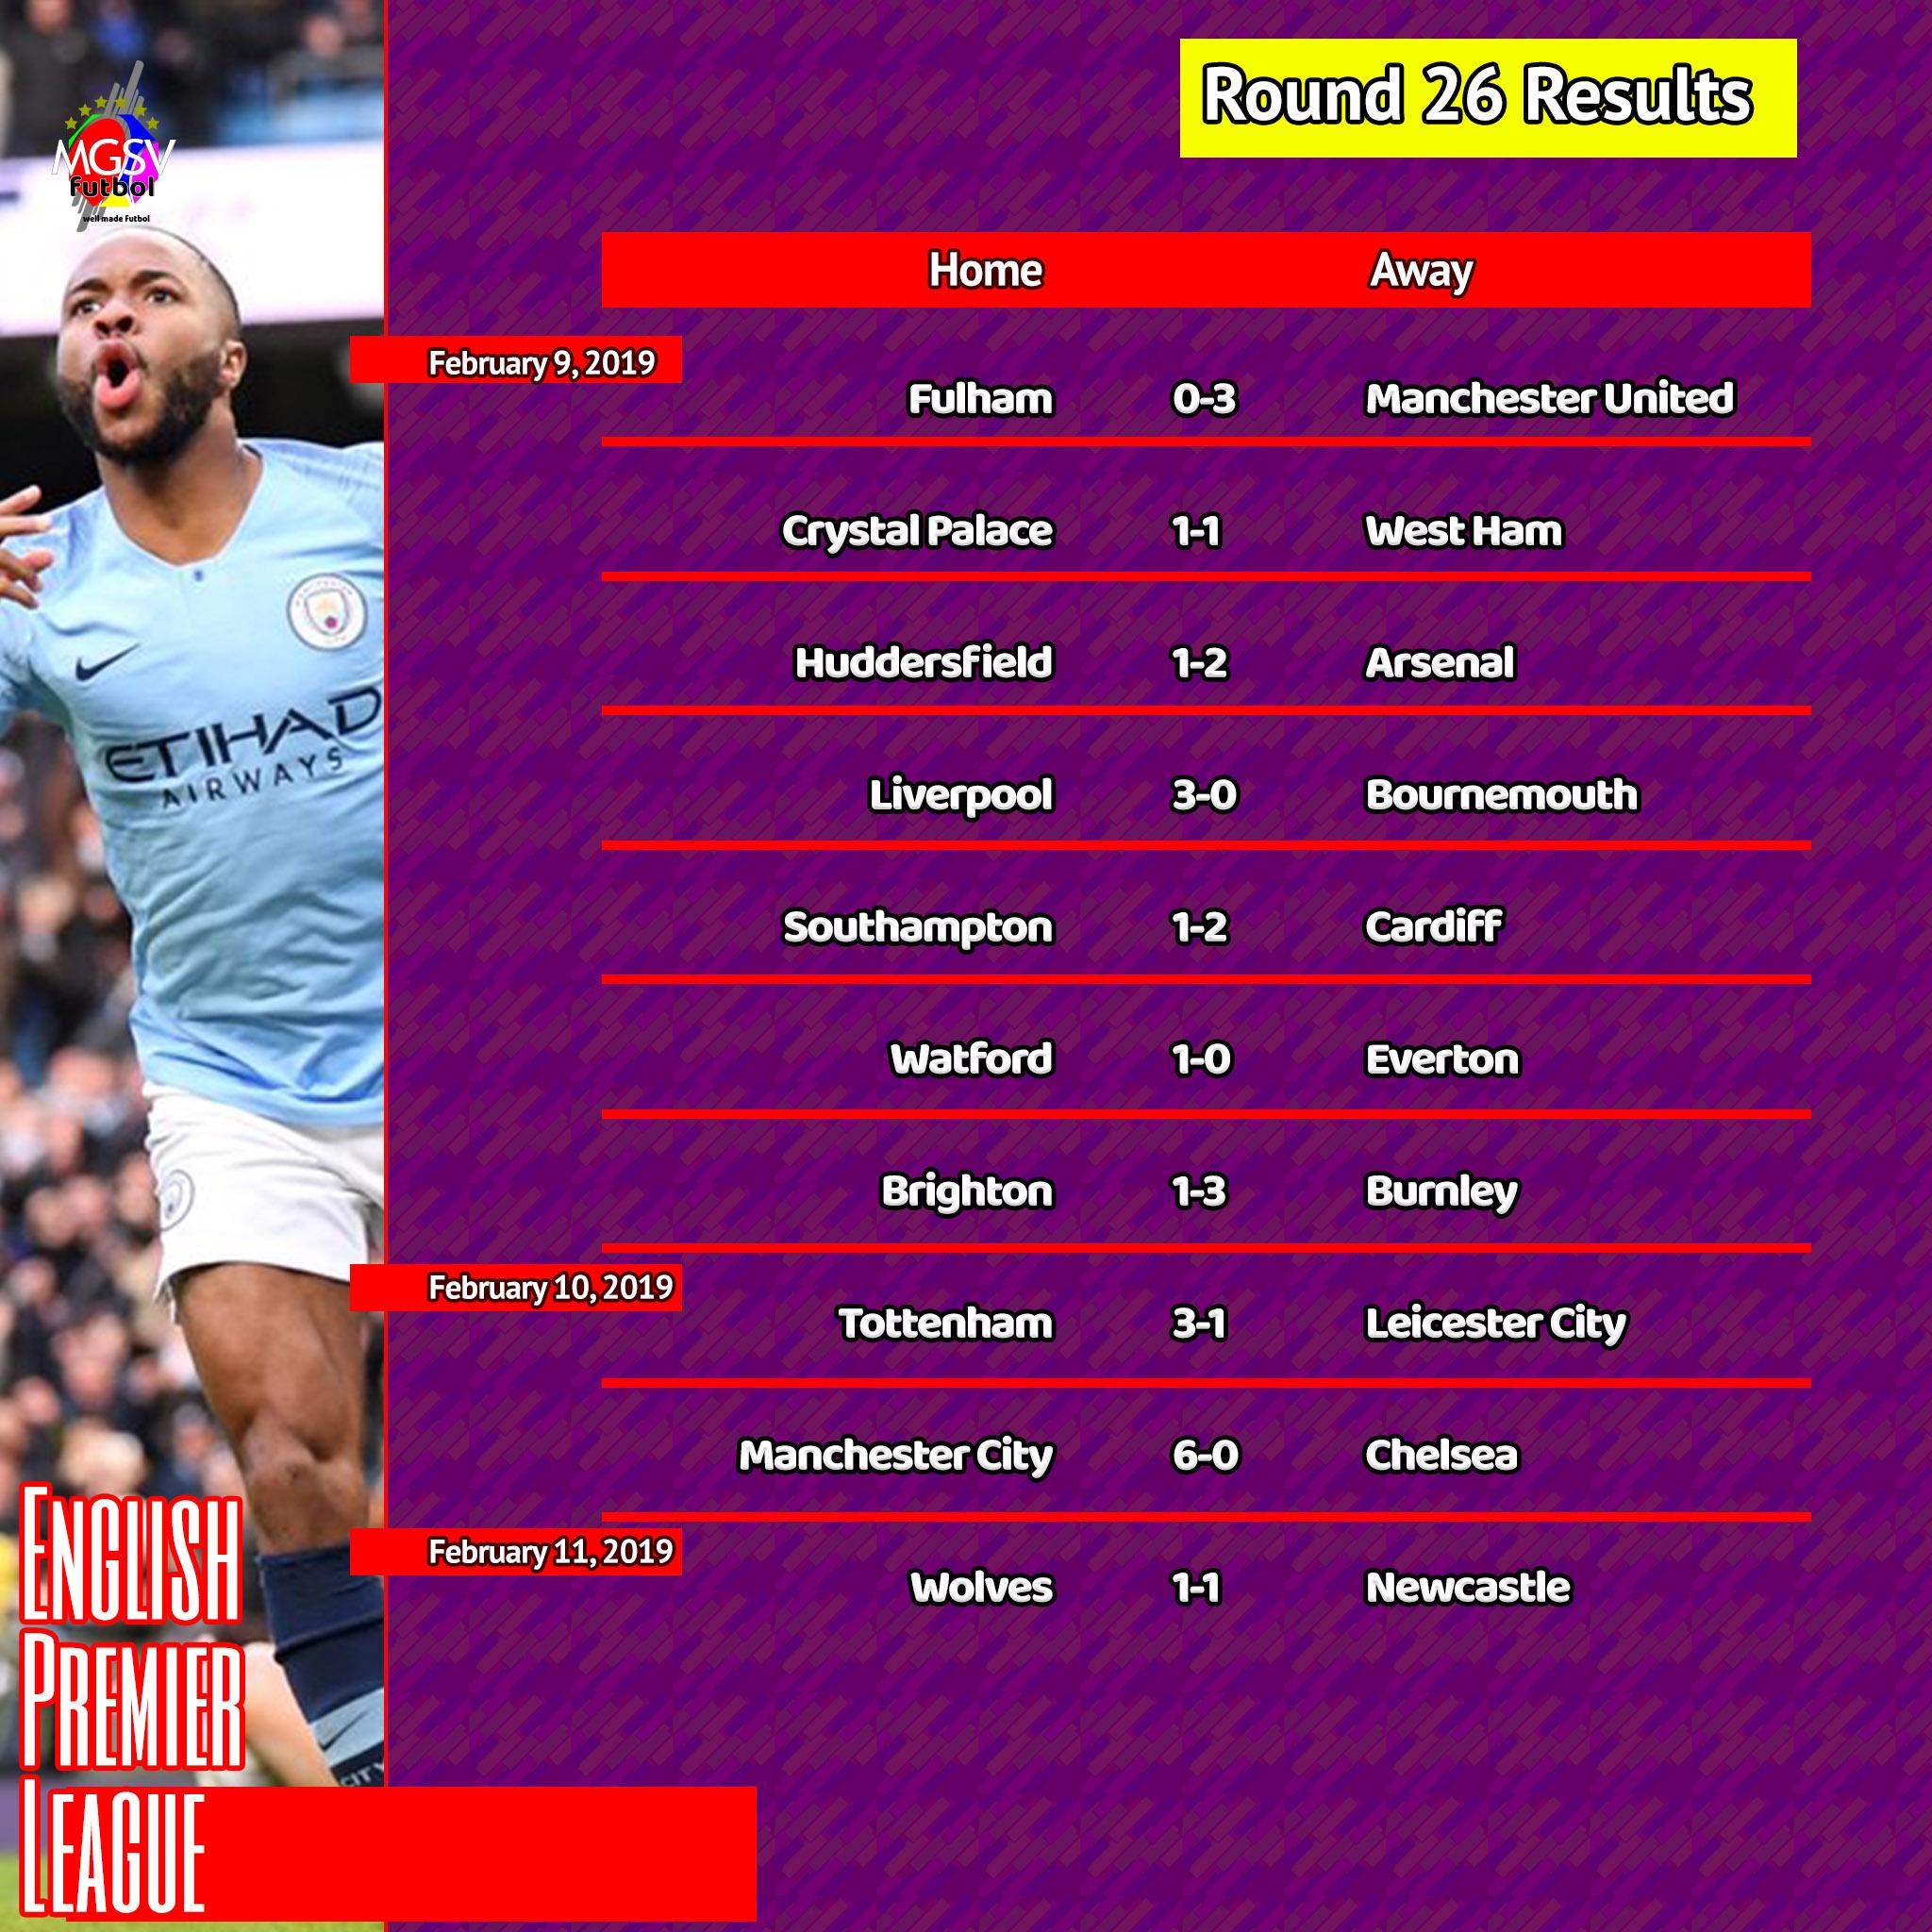 Champions League 4 Matchday Round Season 2018 2019: 2018/19 English Premier League